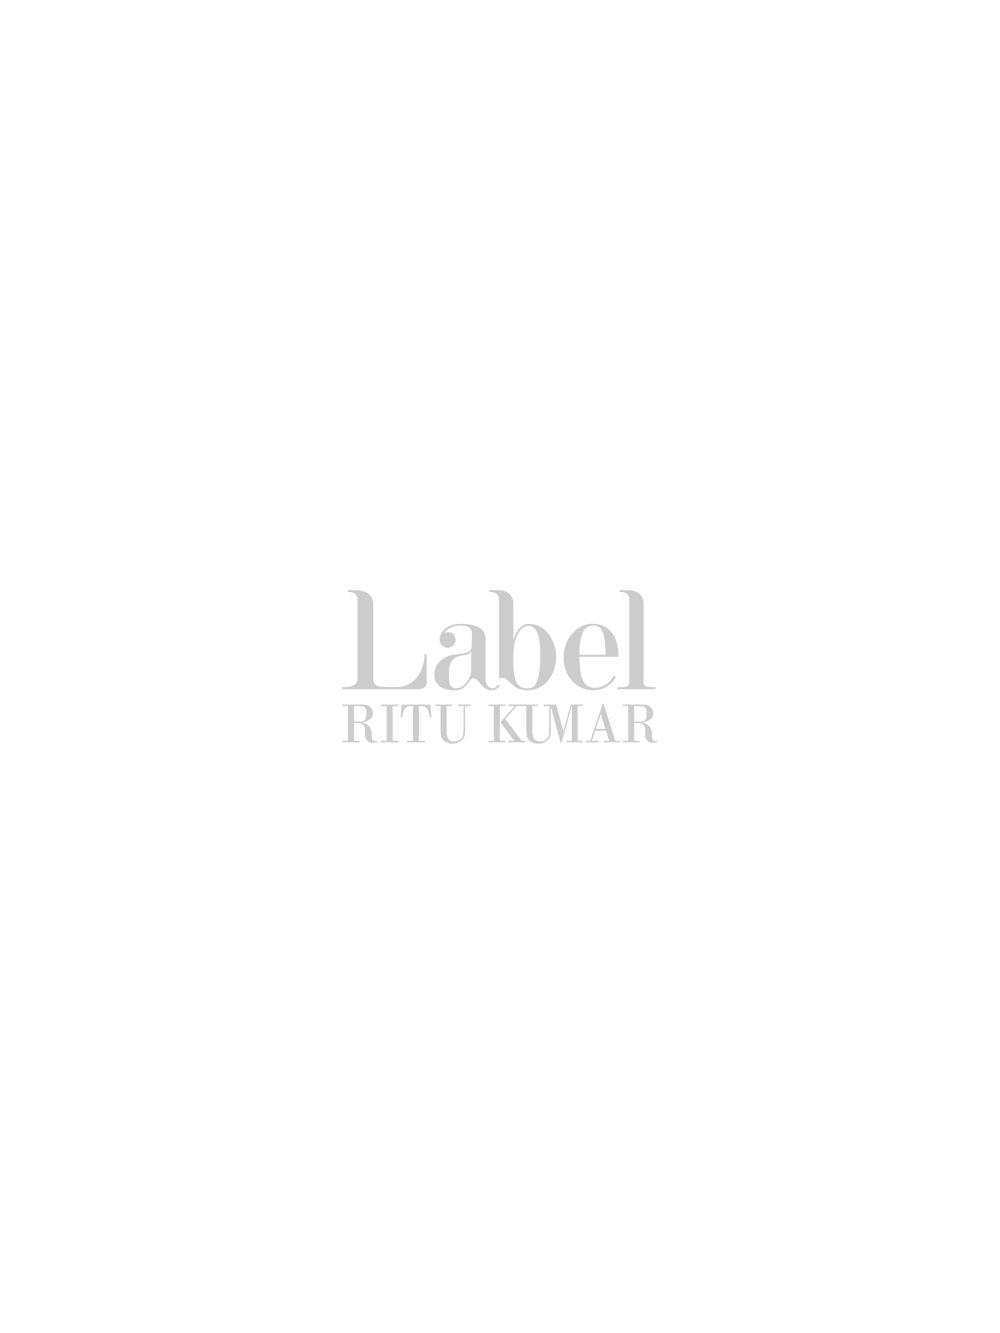 Metallic Blue Pleated Top by Label Ritu Kumar